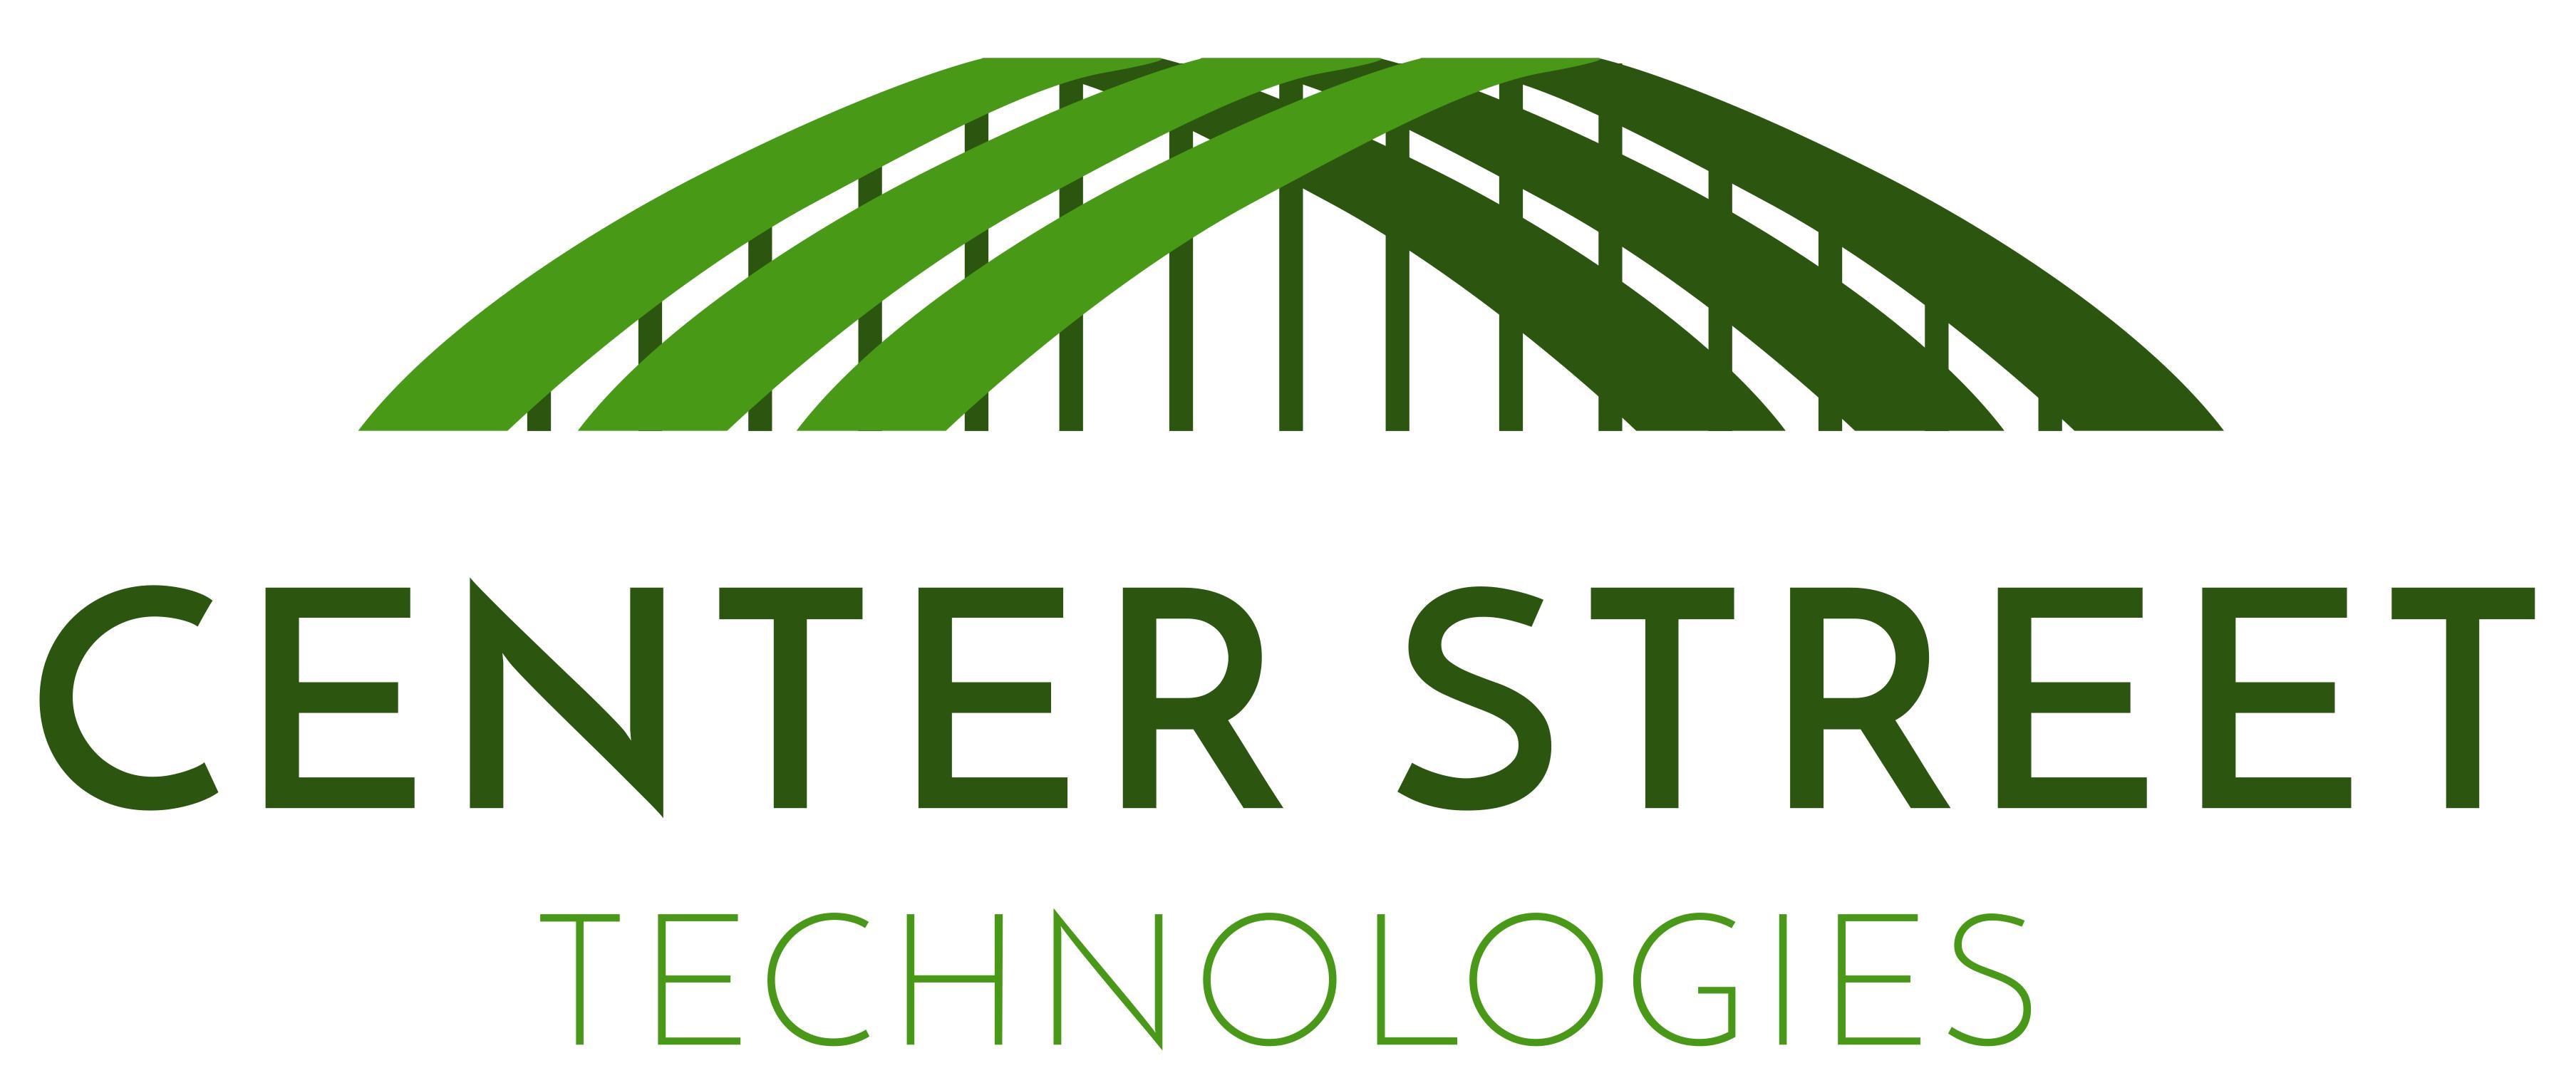 Center Street Technologies logo